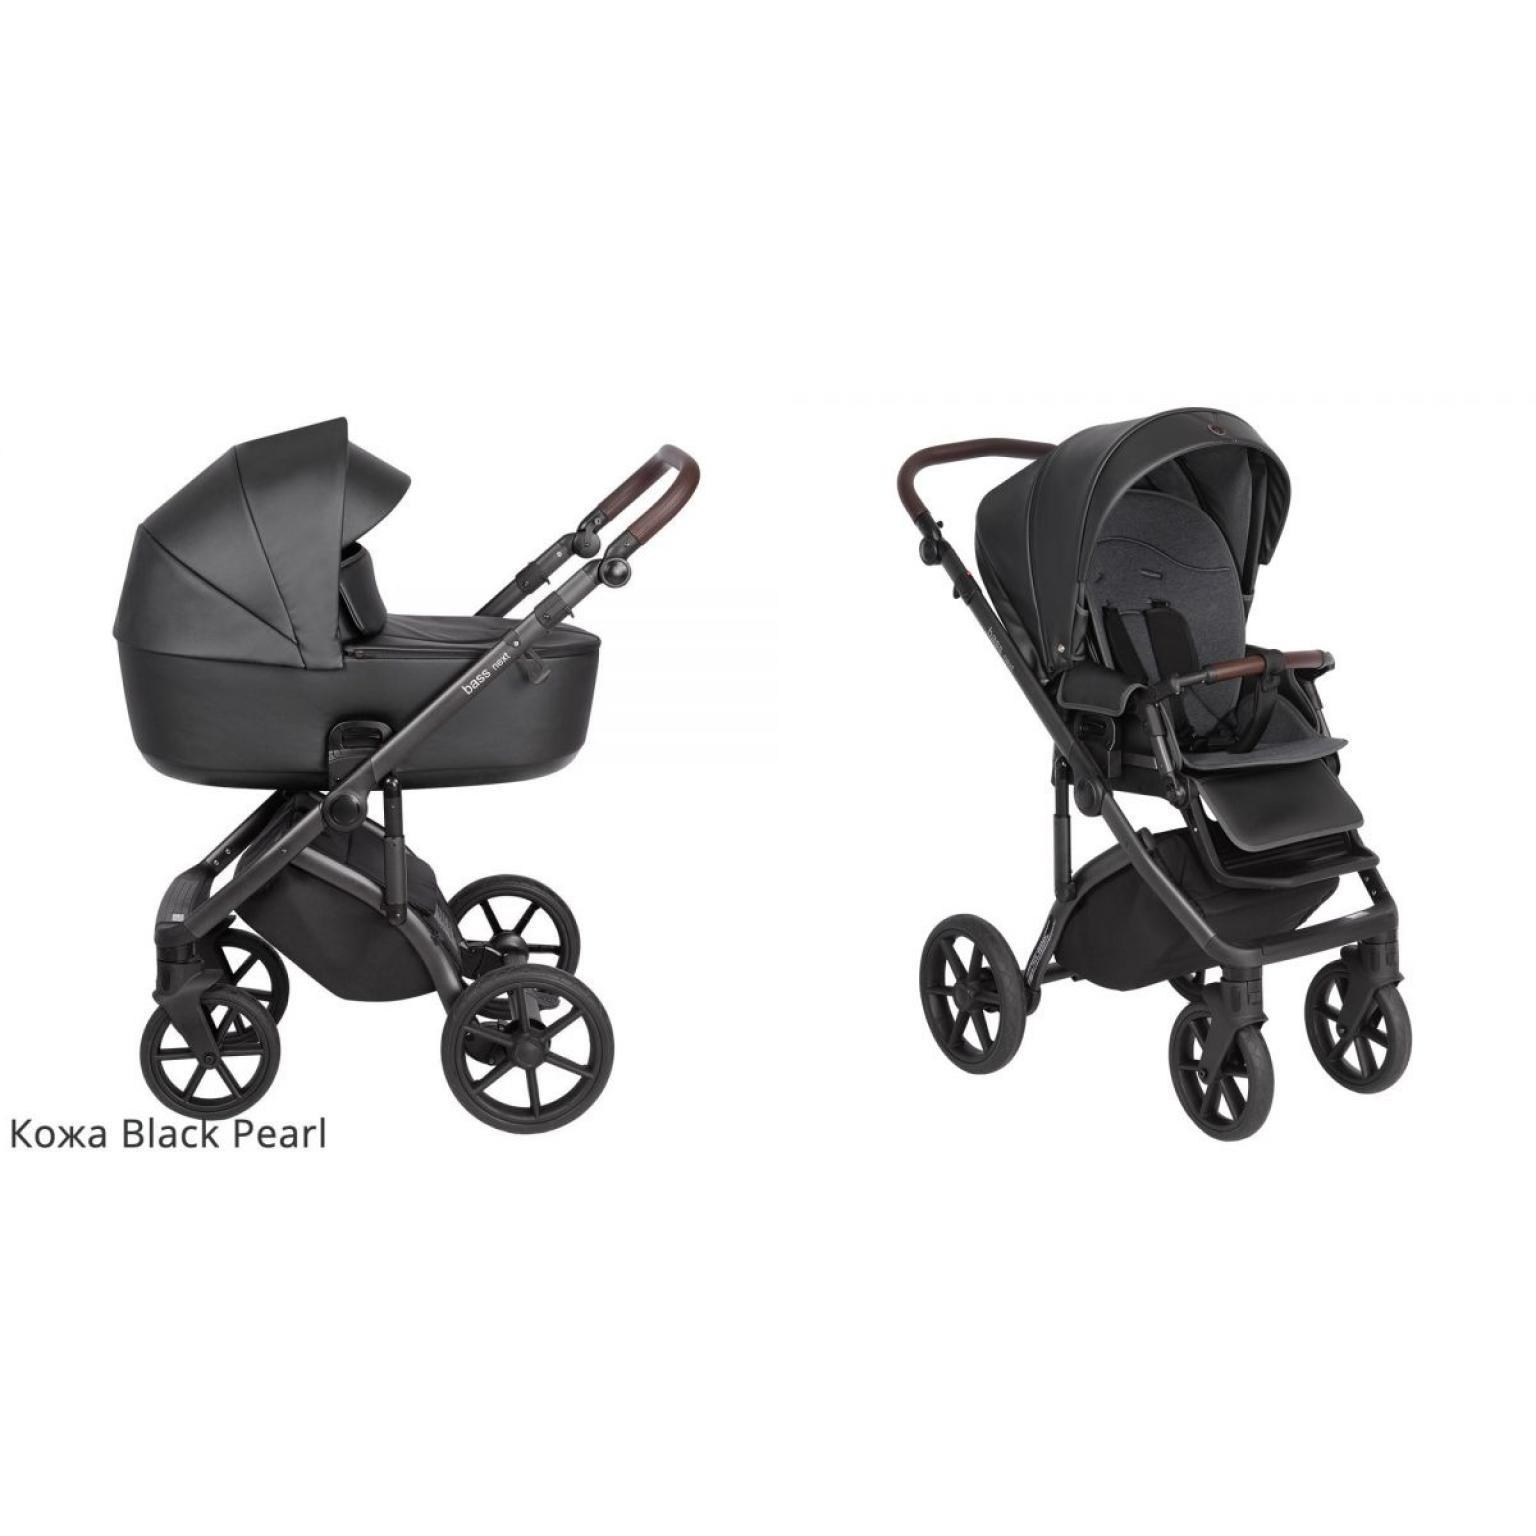 Bērnu-rati-ROAN-BASS-NEXT-ECO-ĀDA-black-детская-коляска